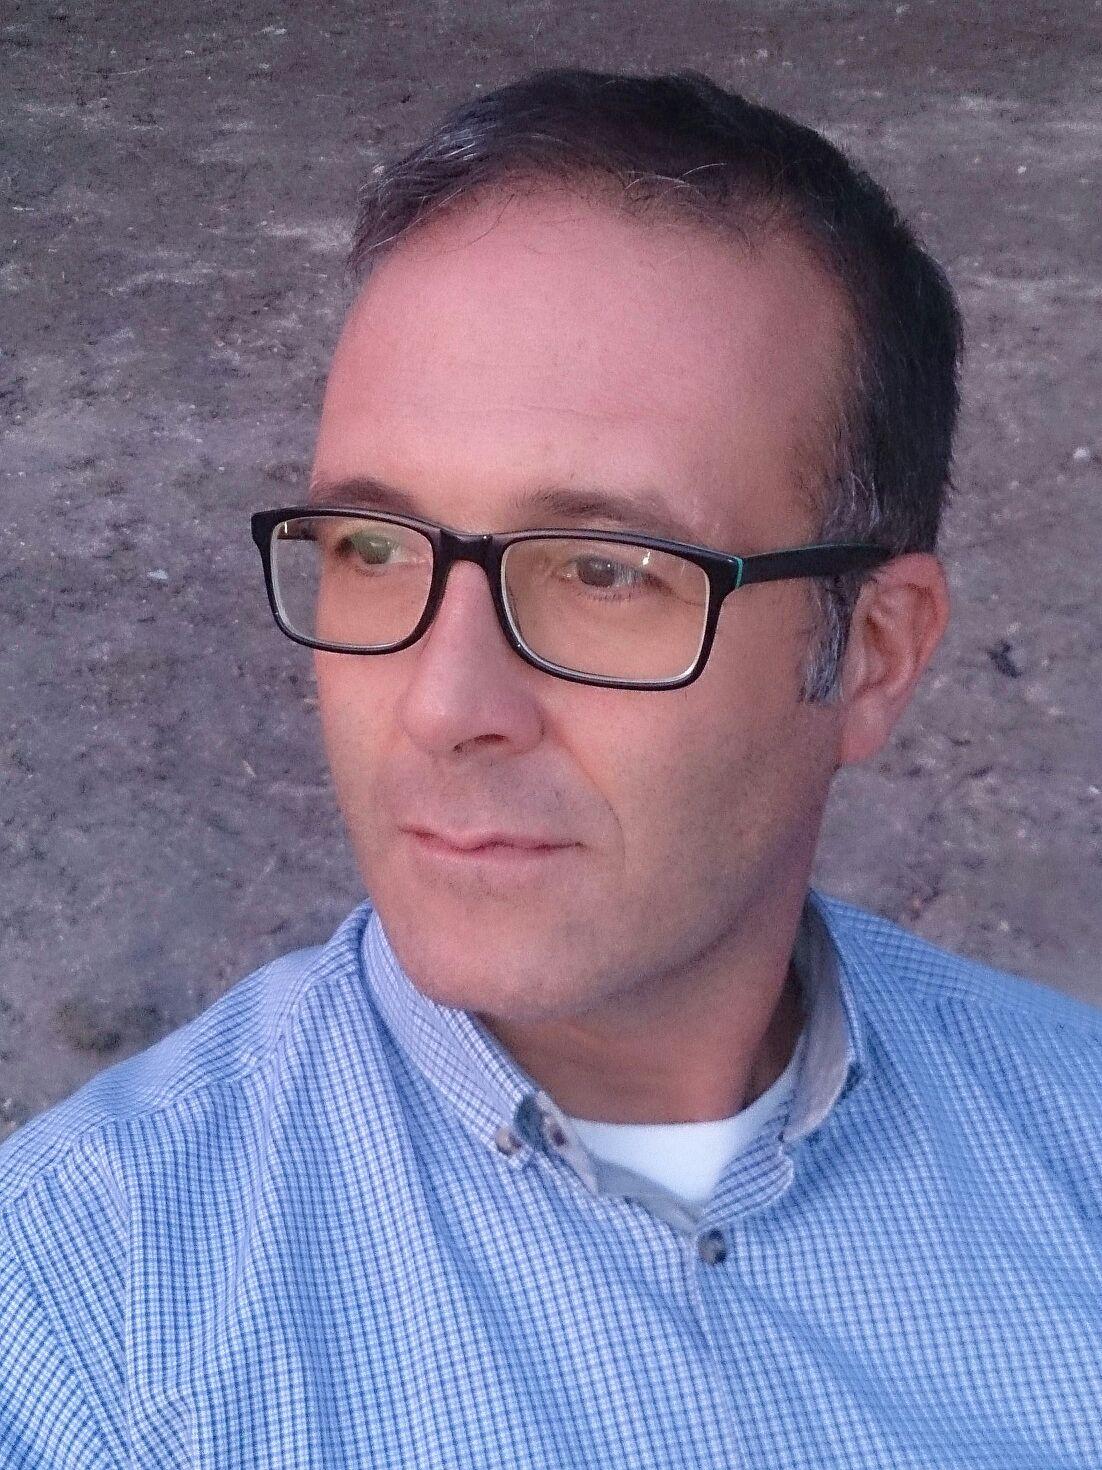 David O'Fferrall